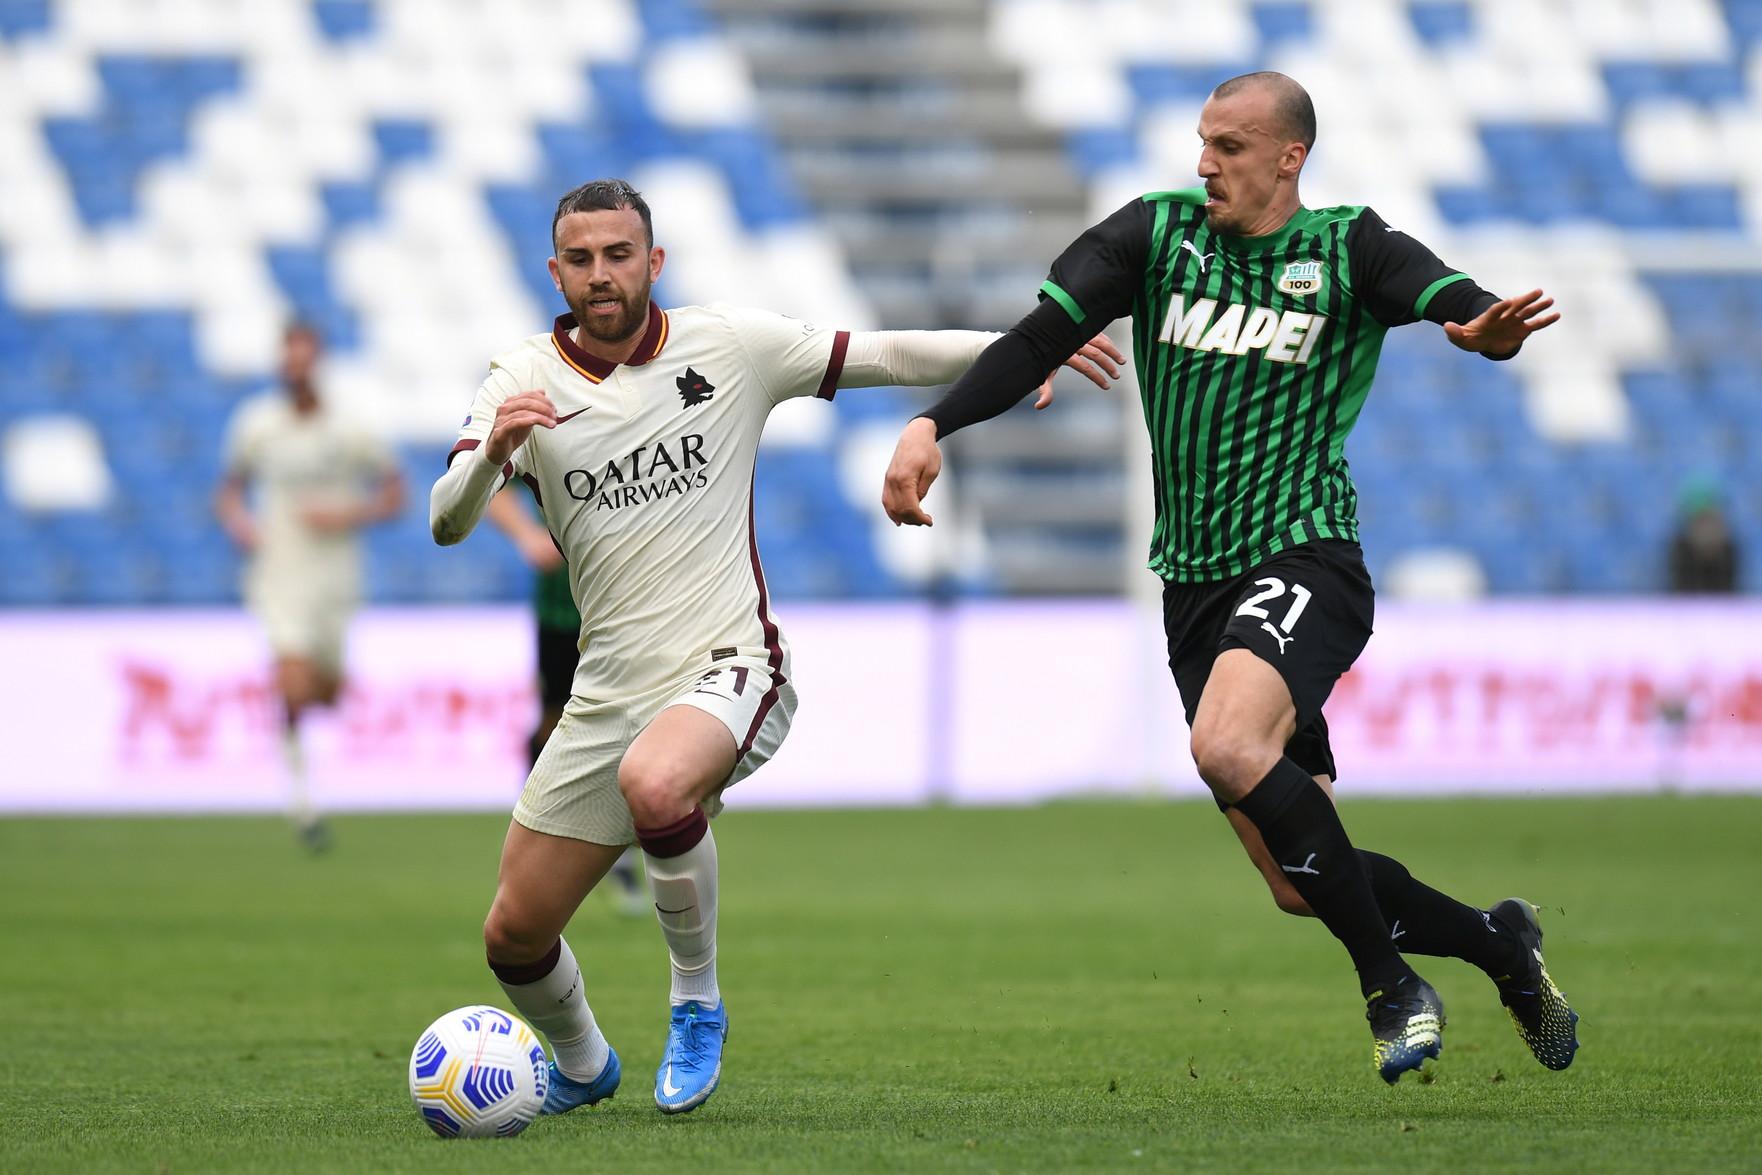 Serie A, Sassuolo-Roma 2-2: per Fonseca la Champions si allontana | News -  Sportmediaset